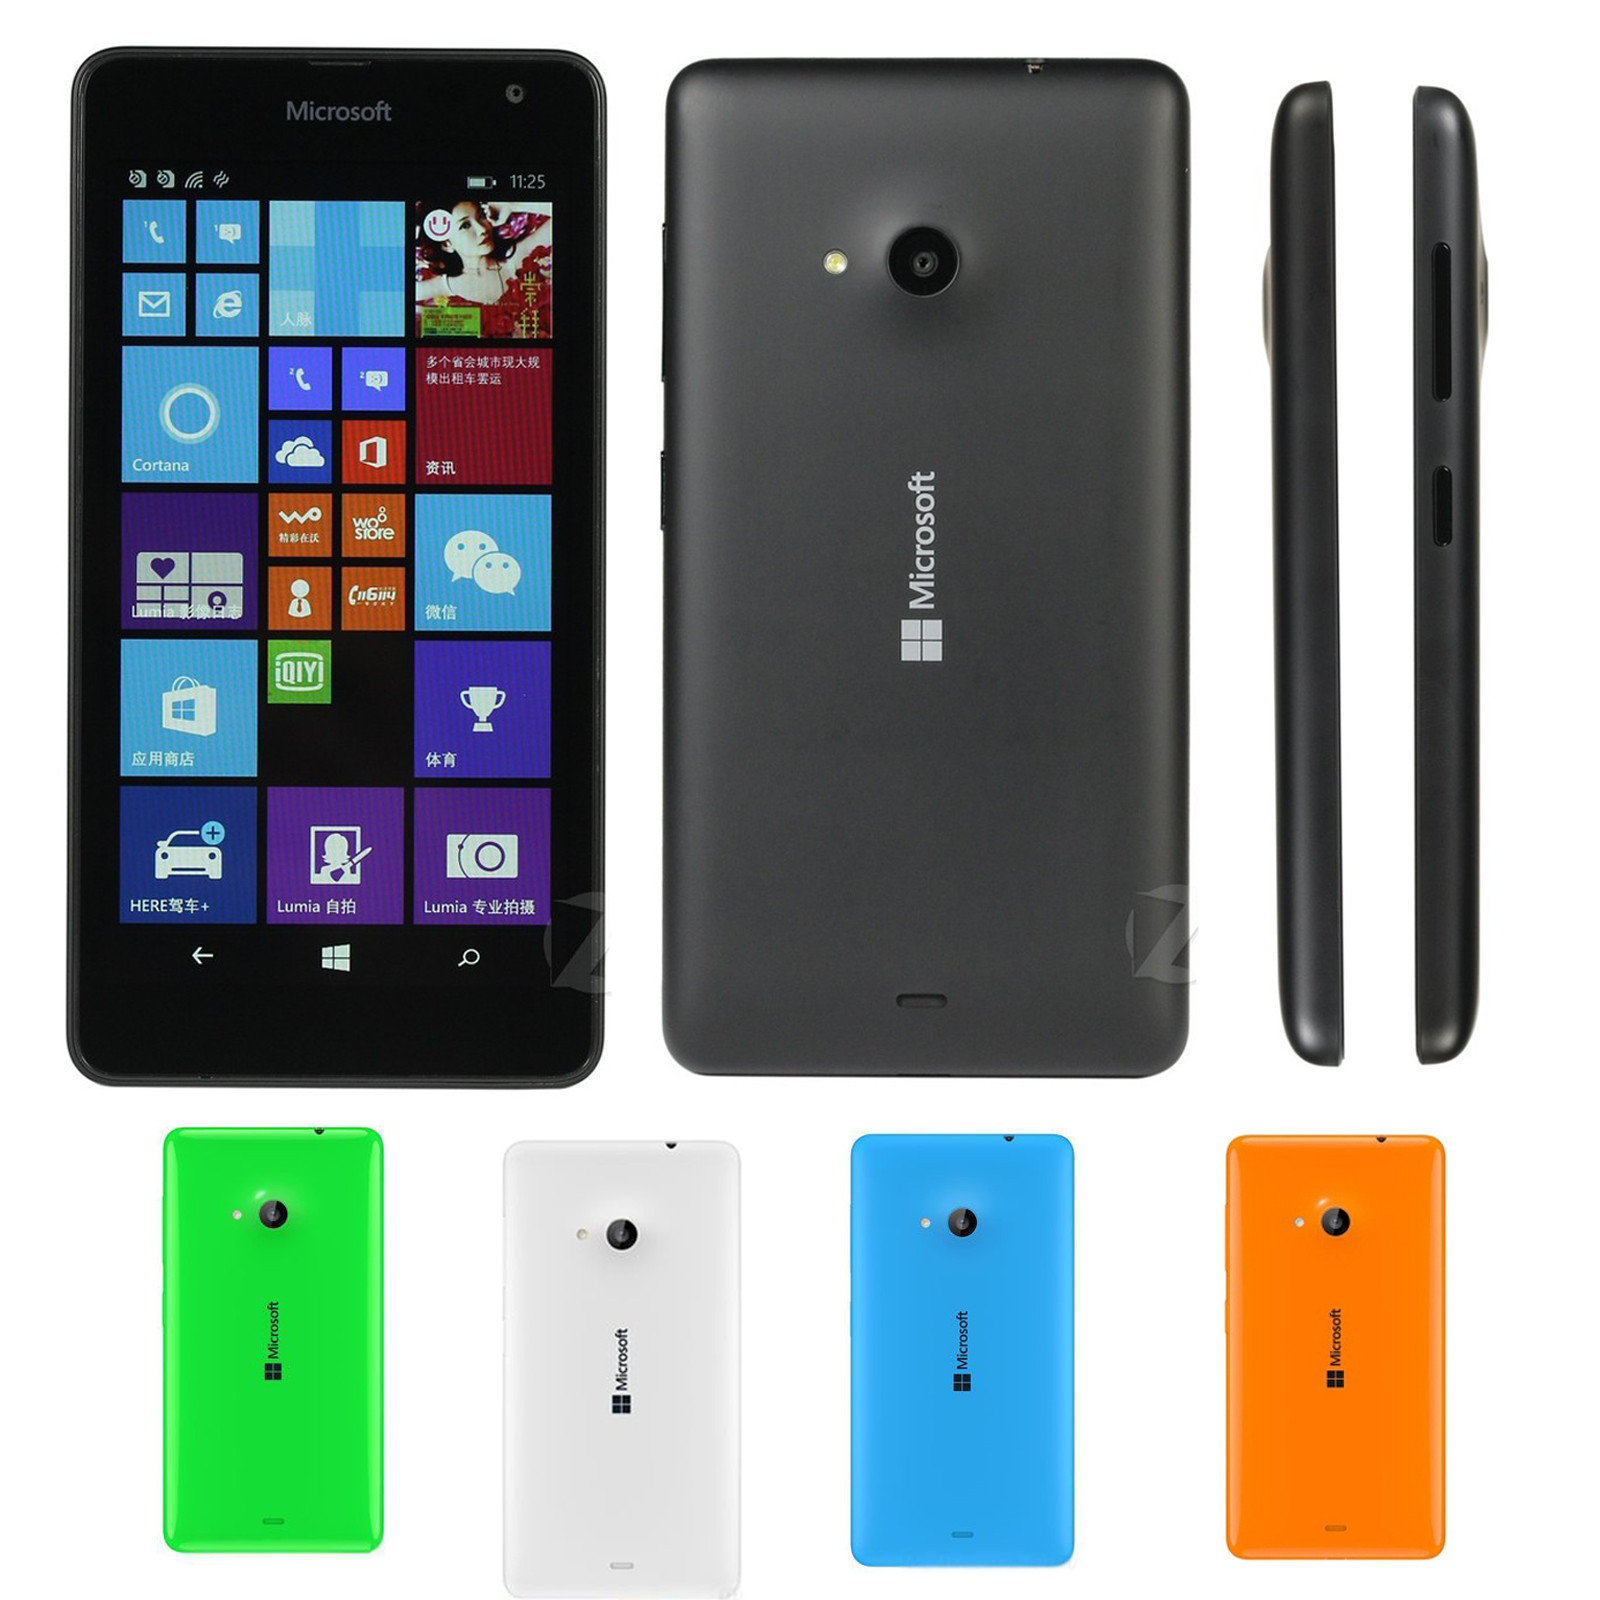 Microsoft lumia 535 dual sim white quad core 1 2ghz unlocked cell - Original New Nokia Microsoft Lumia 535 Dual Sim Unlocked 3g Windows Smartphone